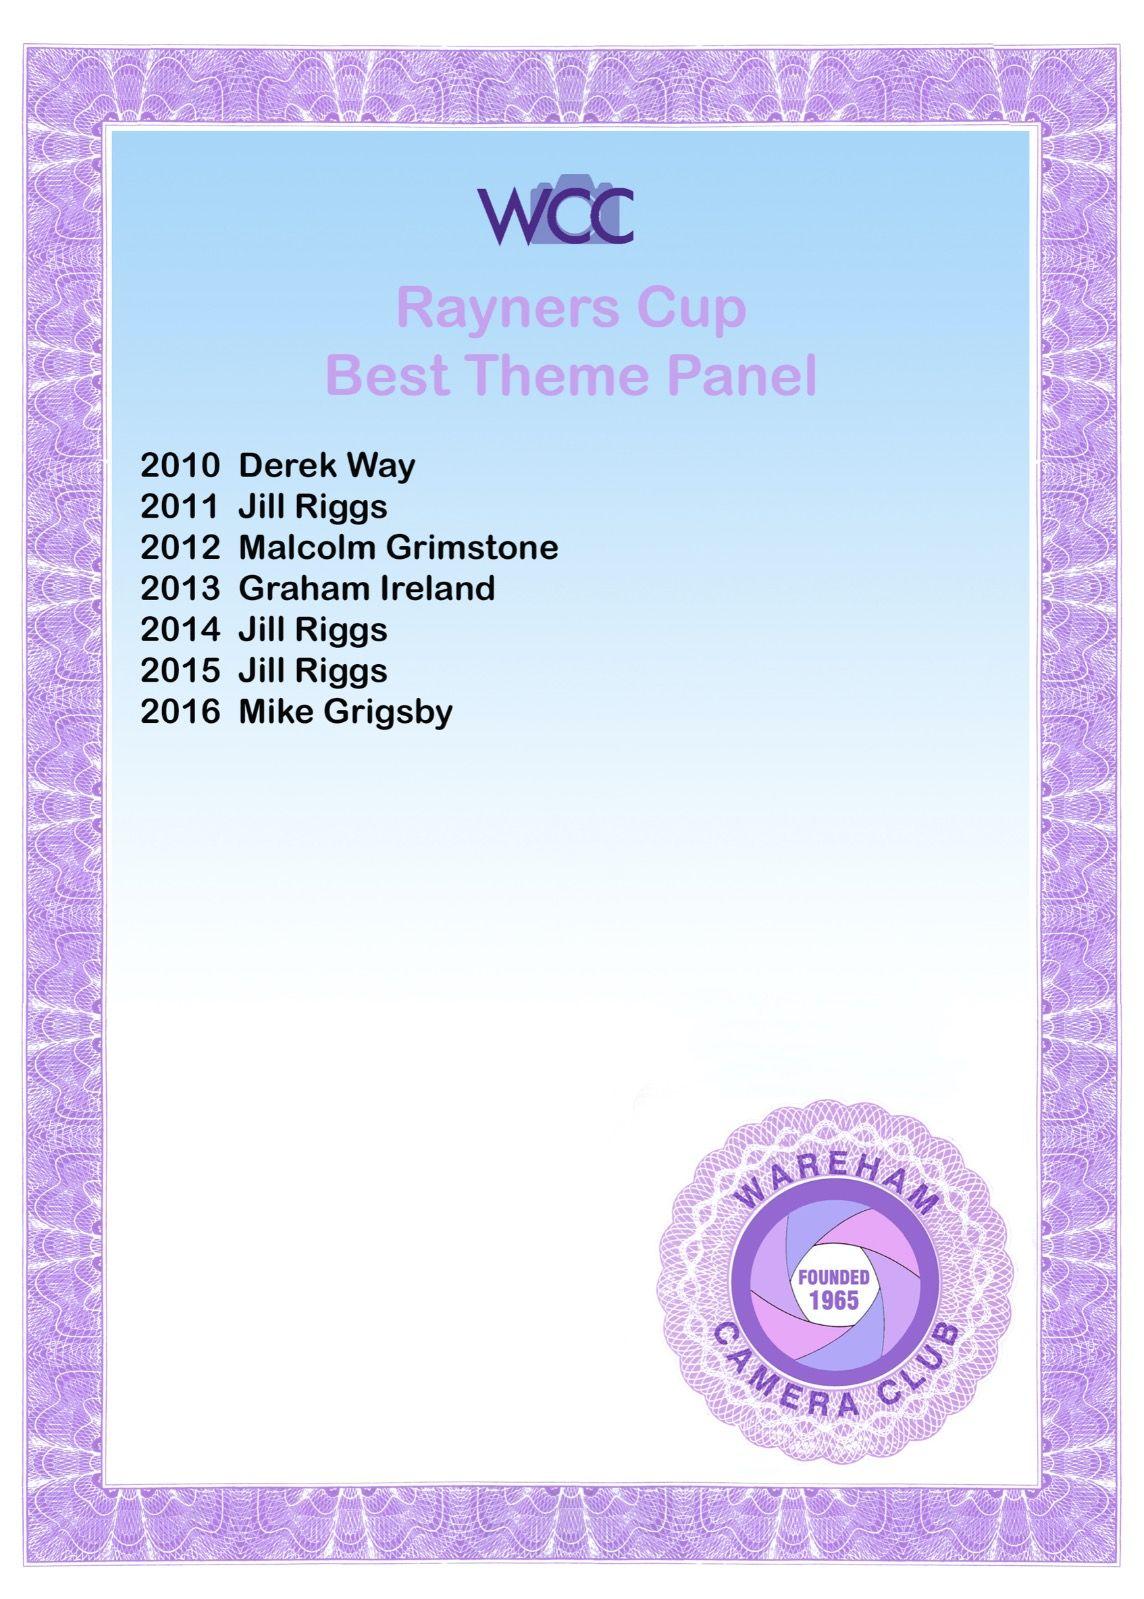 Rayners Cup